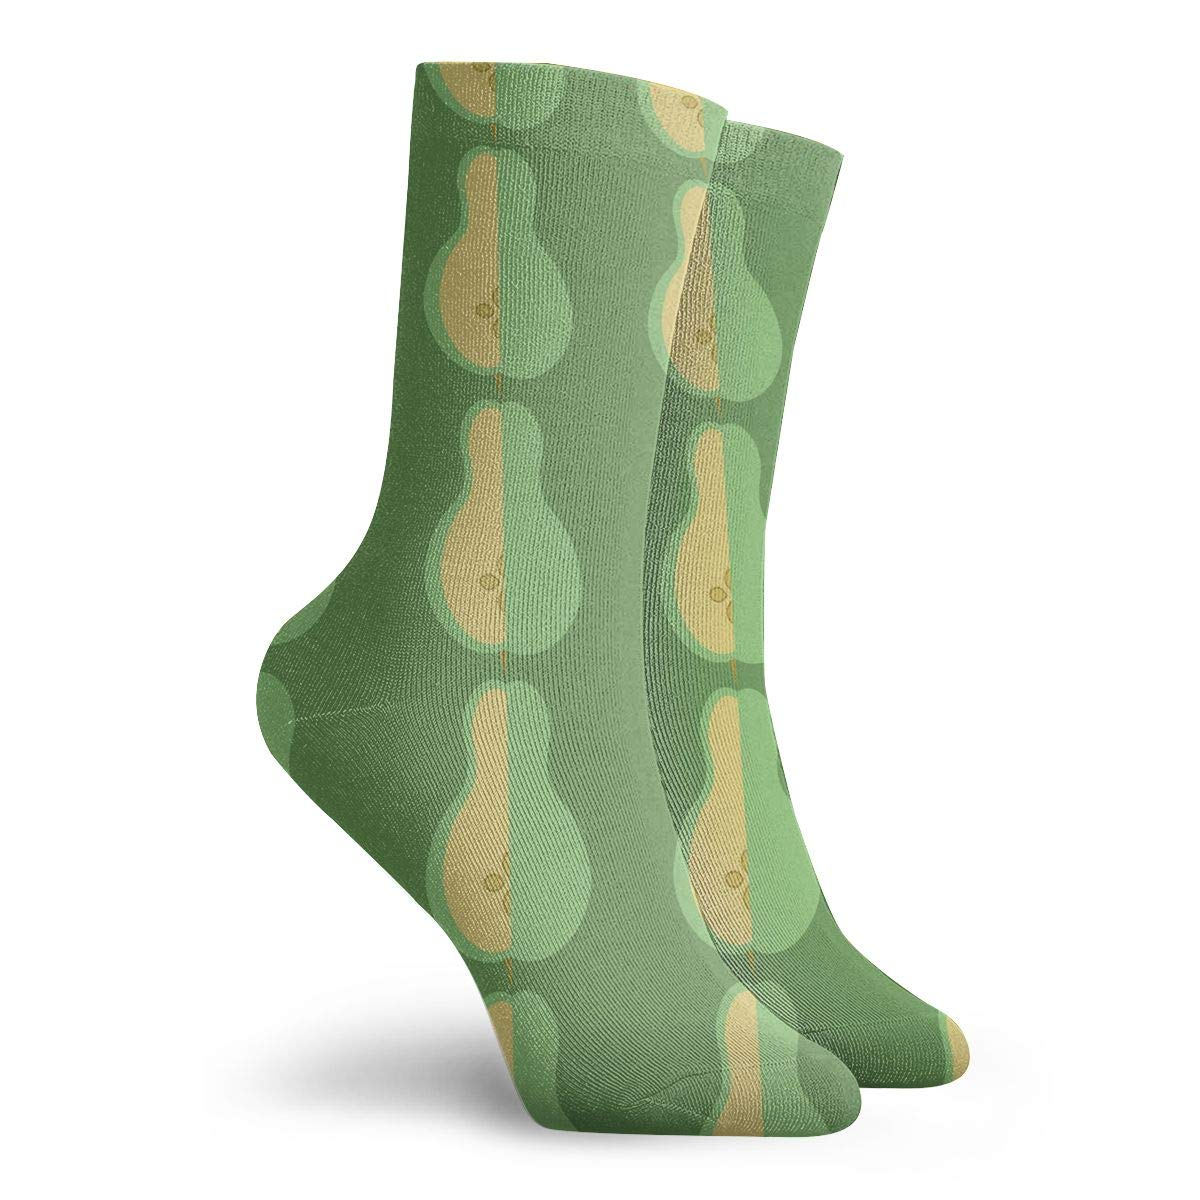 YIEOFH Retro Kids Safari Lion Wildlife Novelty Boys Girls Fashion Cute Funny Casual Art Crew Socks